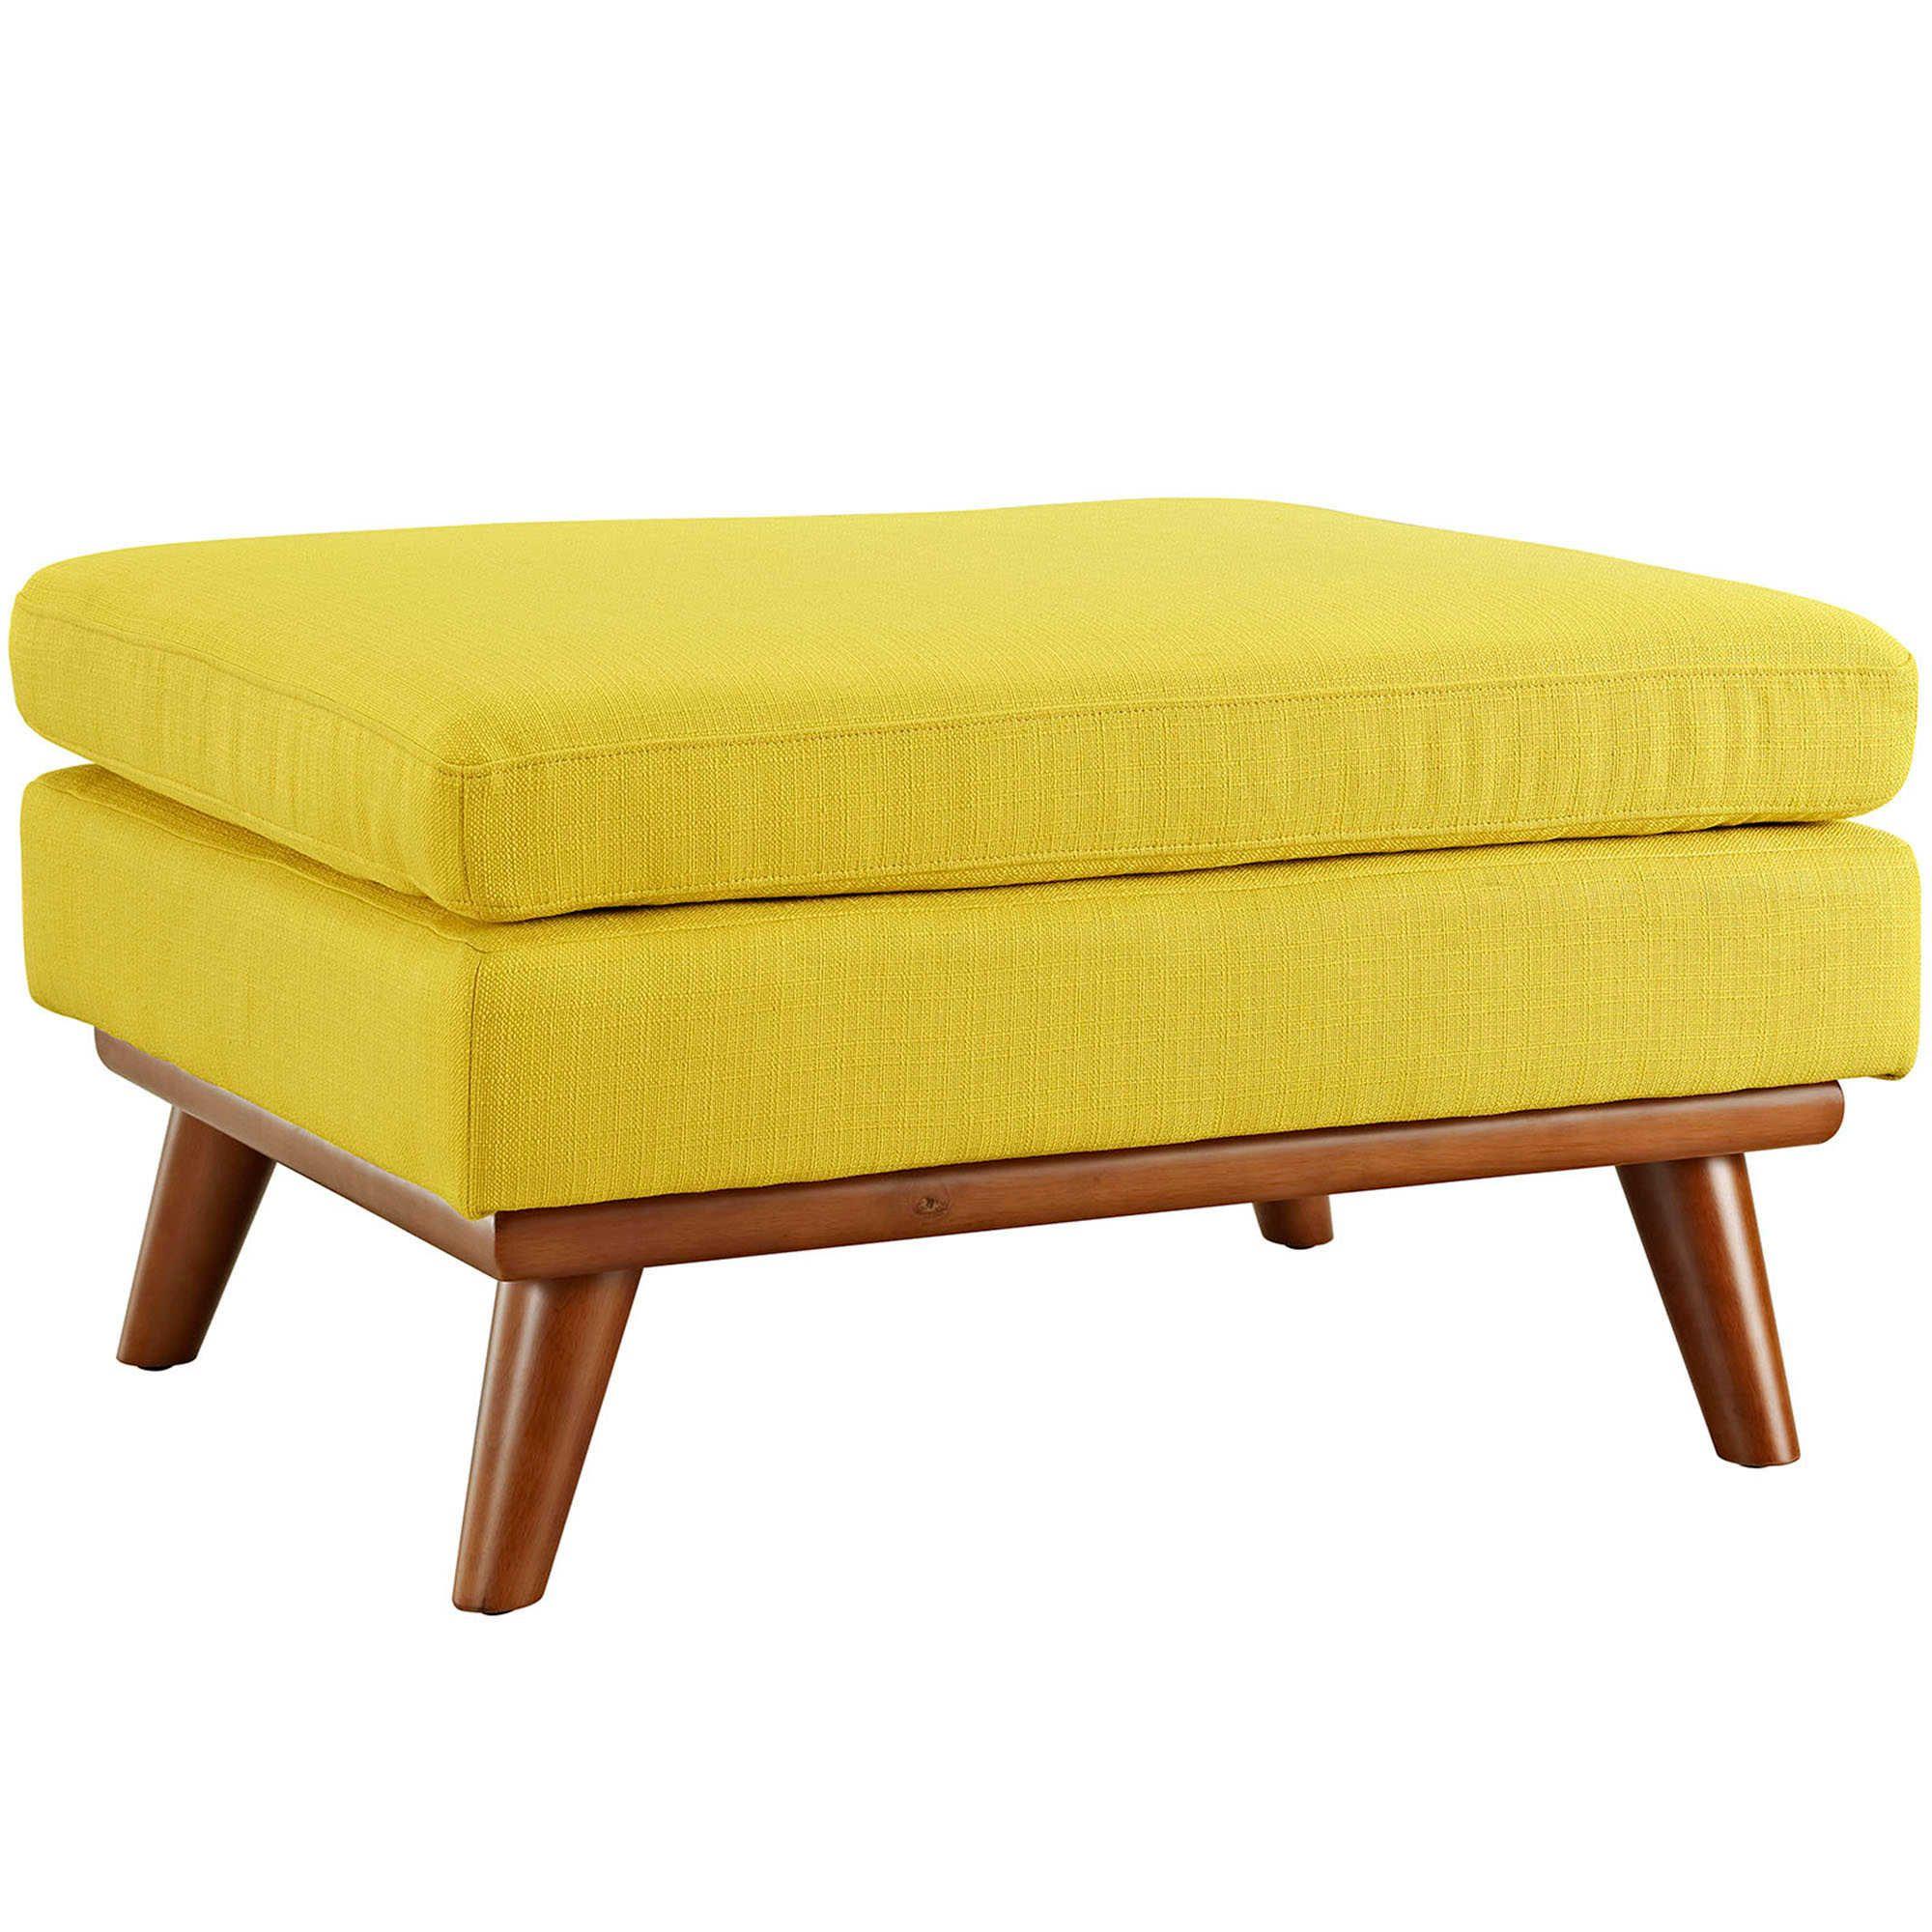 Modway Engage Ottoman Bed Bath Beyond Fabric Ottoman Chair